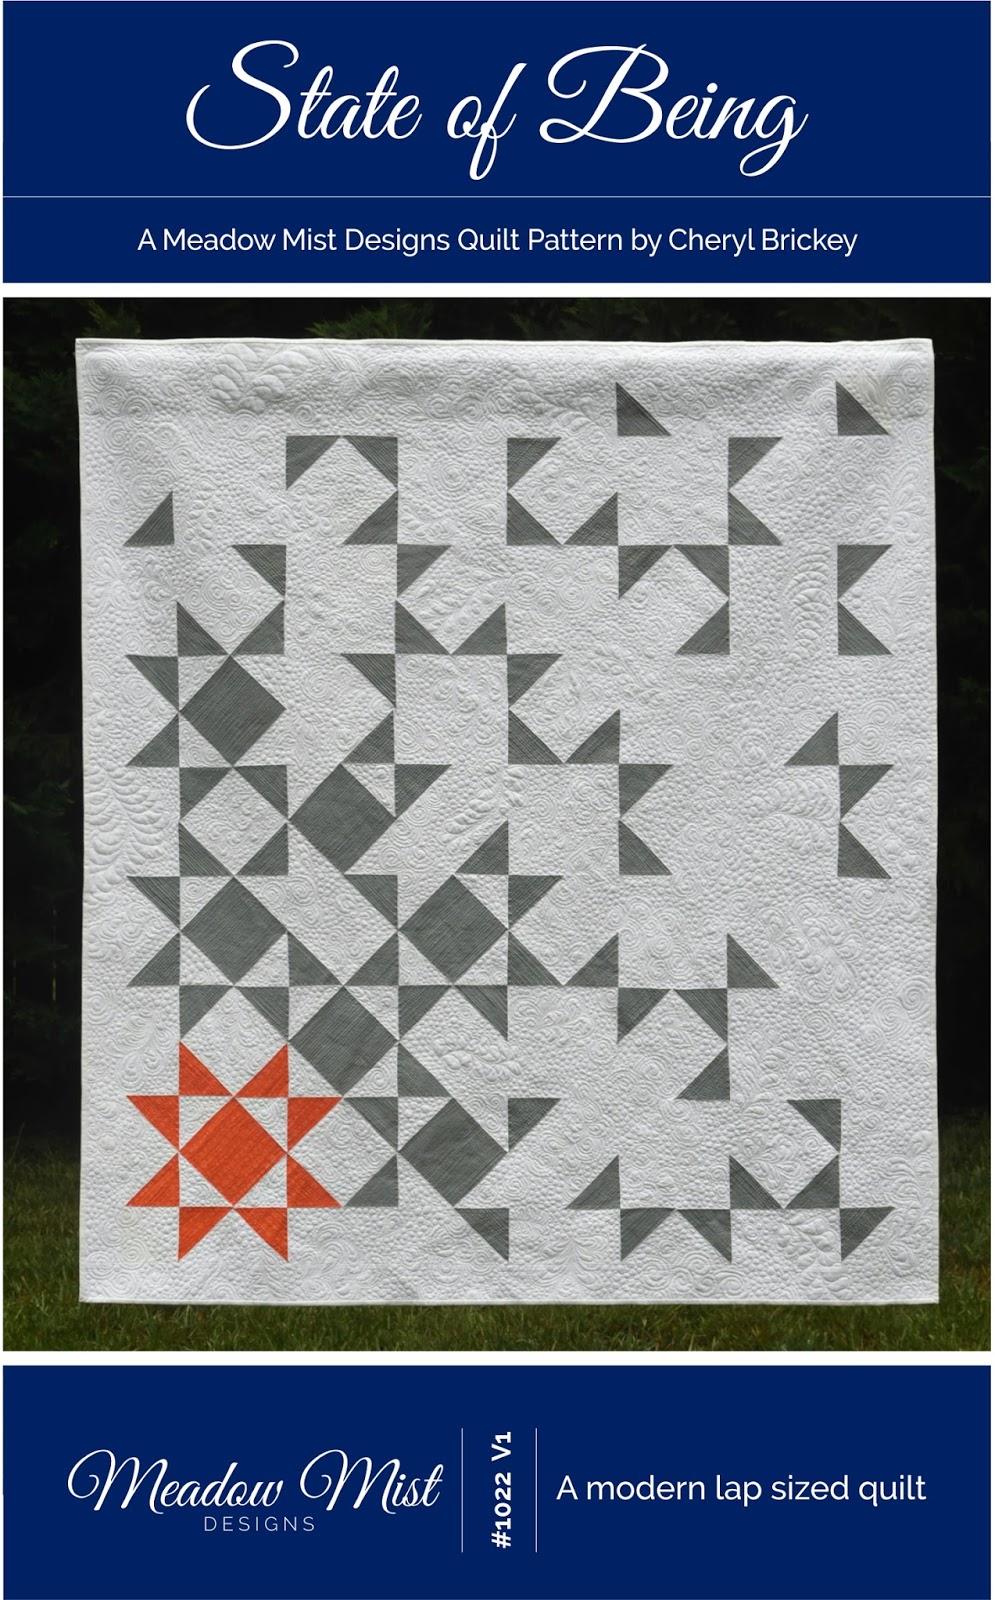 Meadow Mist Designs: Patterns